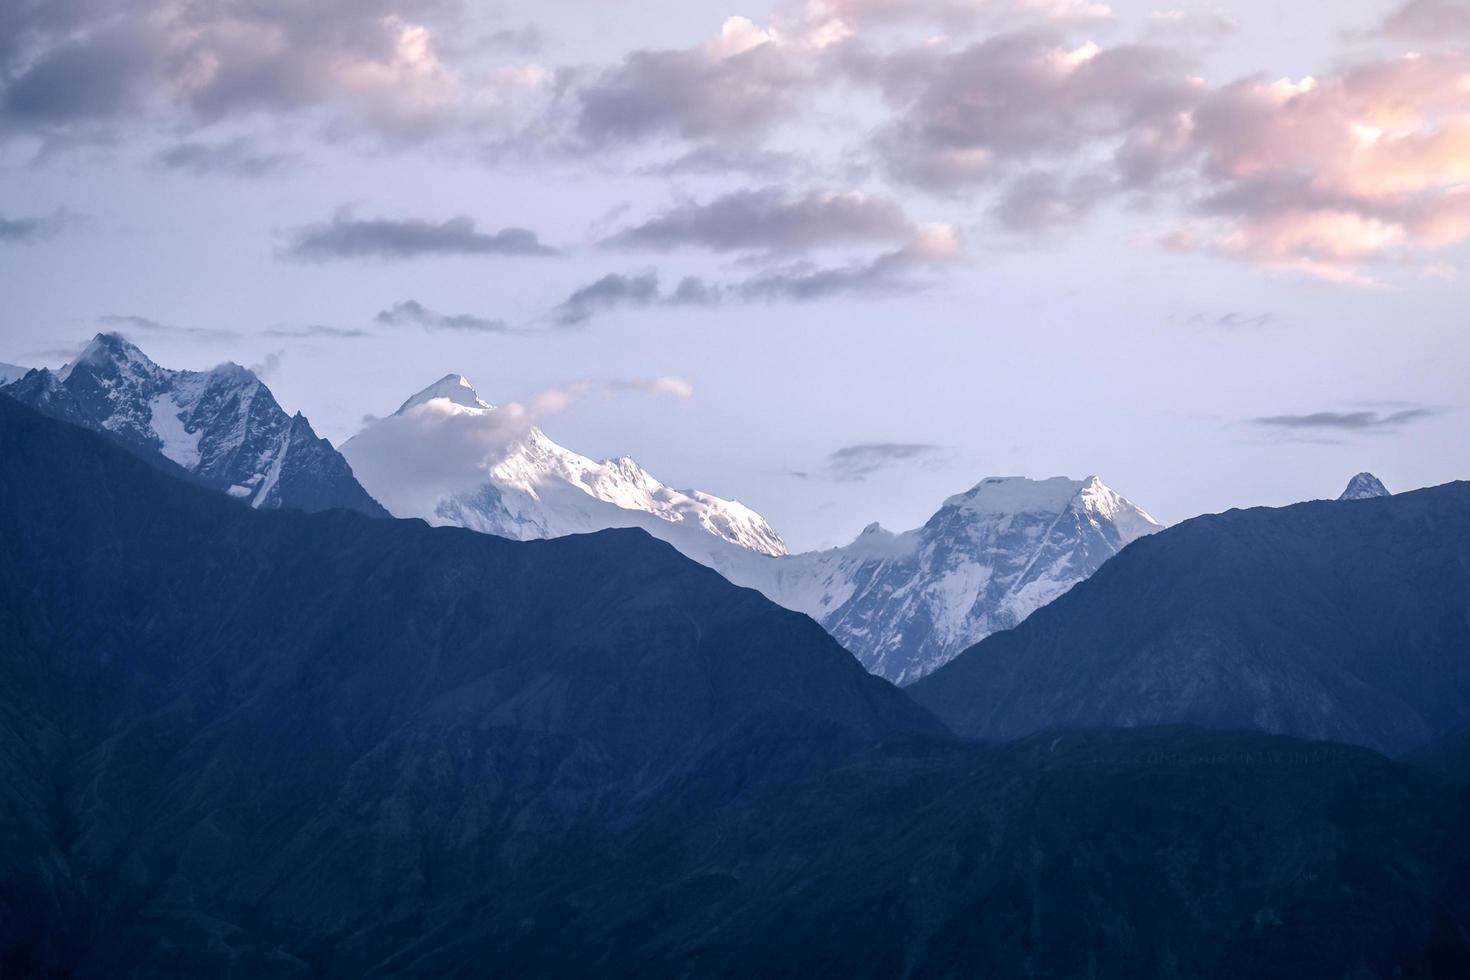 alba sopra la catena montuosa innevata del karakoram, Pakistan foto